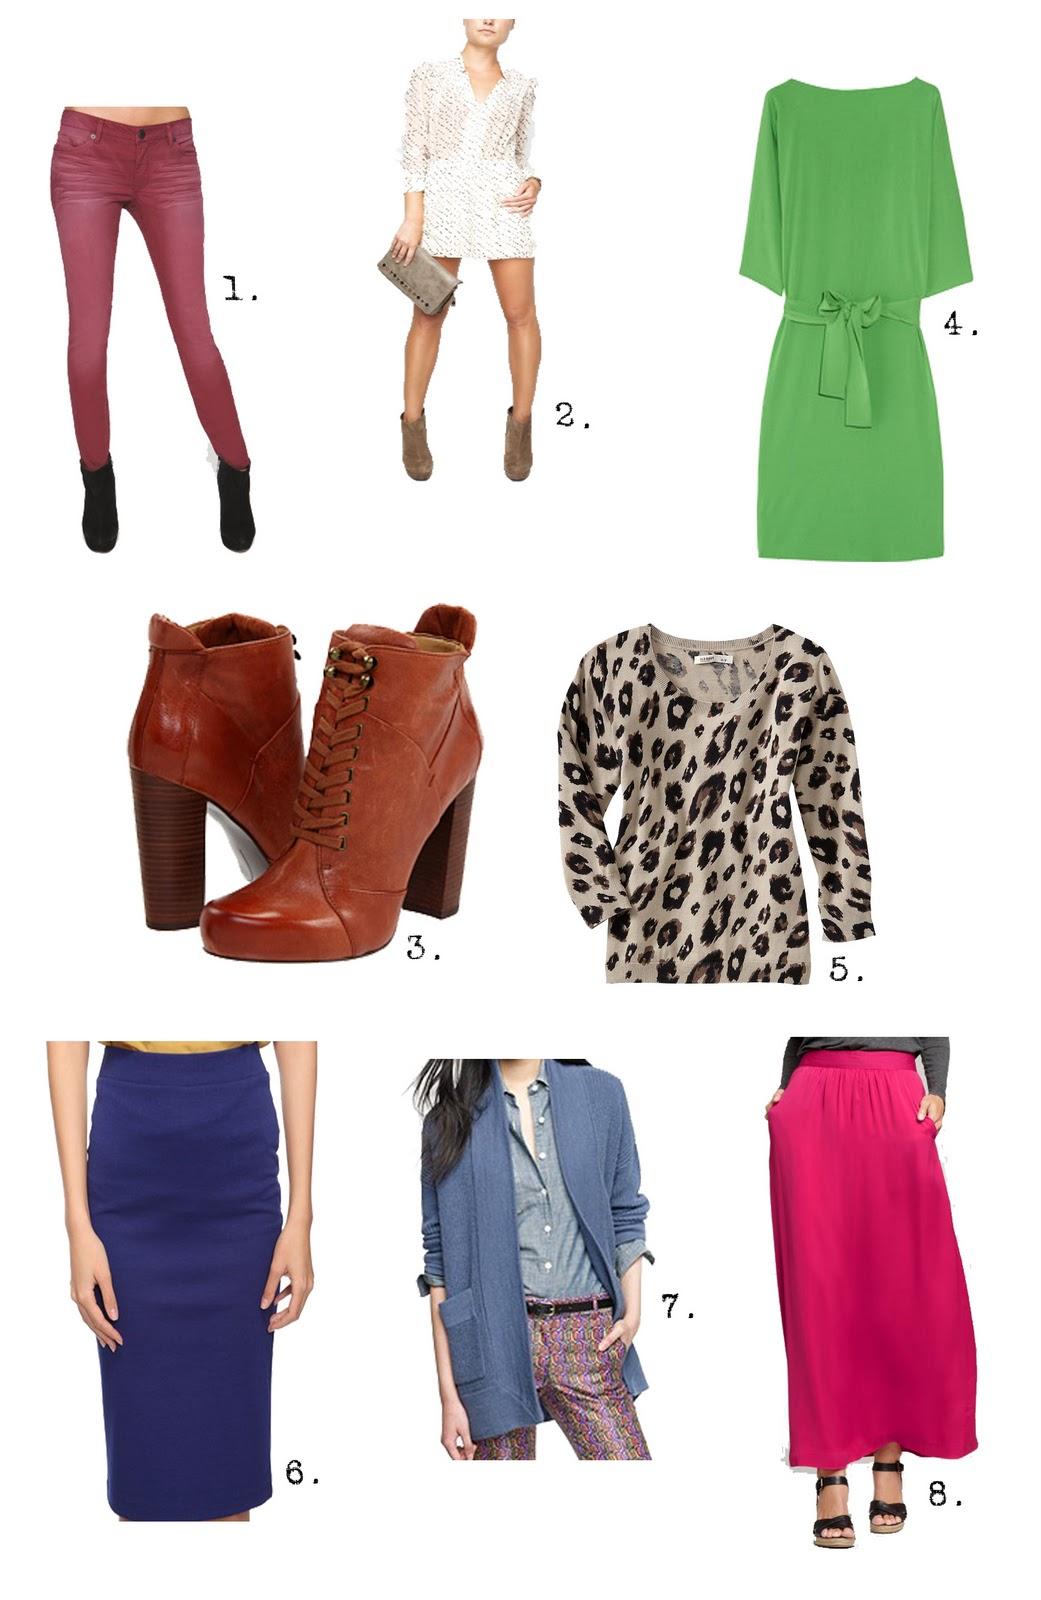 Fashion Fix - Straight A Style